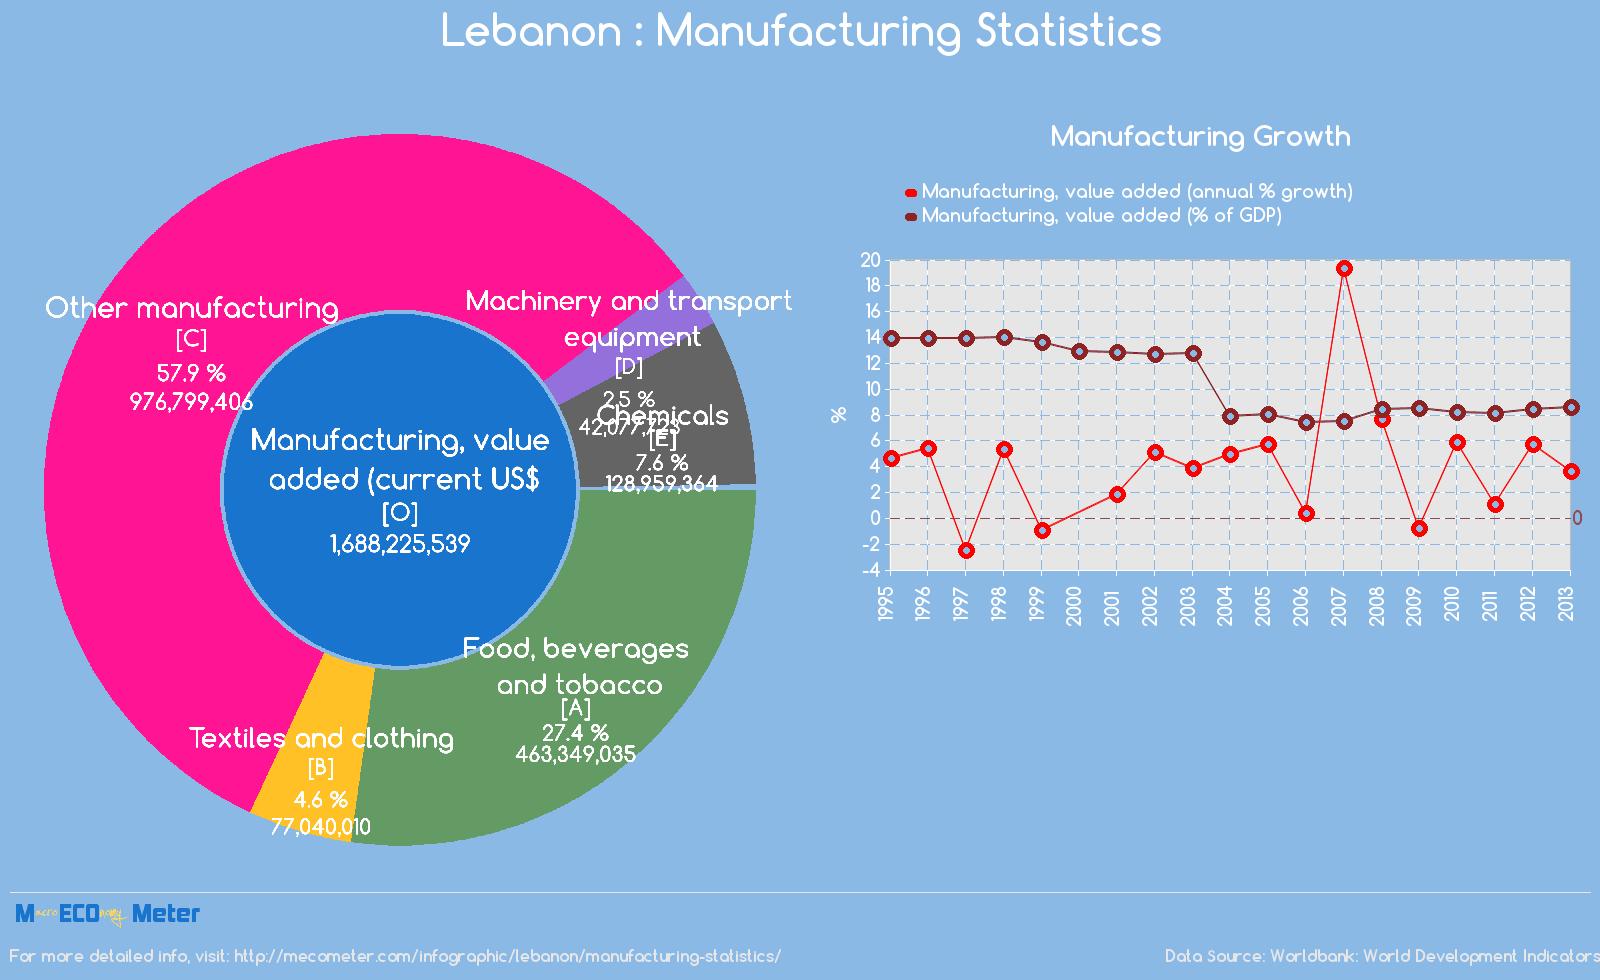 Lebanon : Manufacturing Statistics